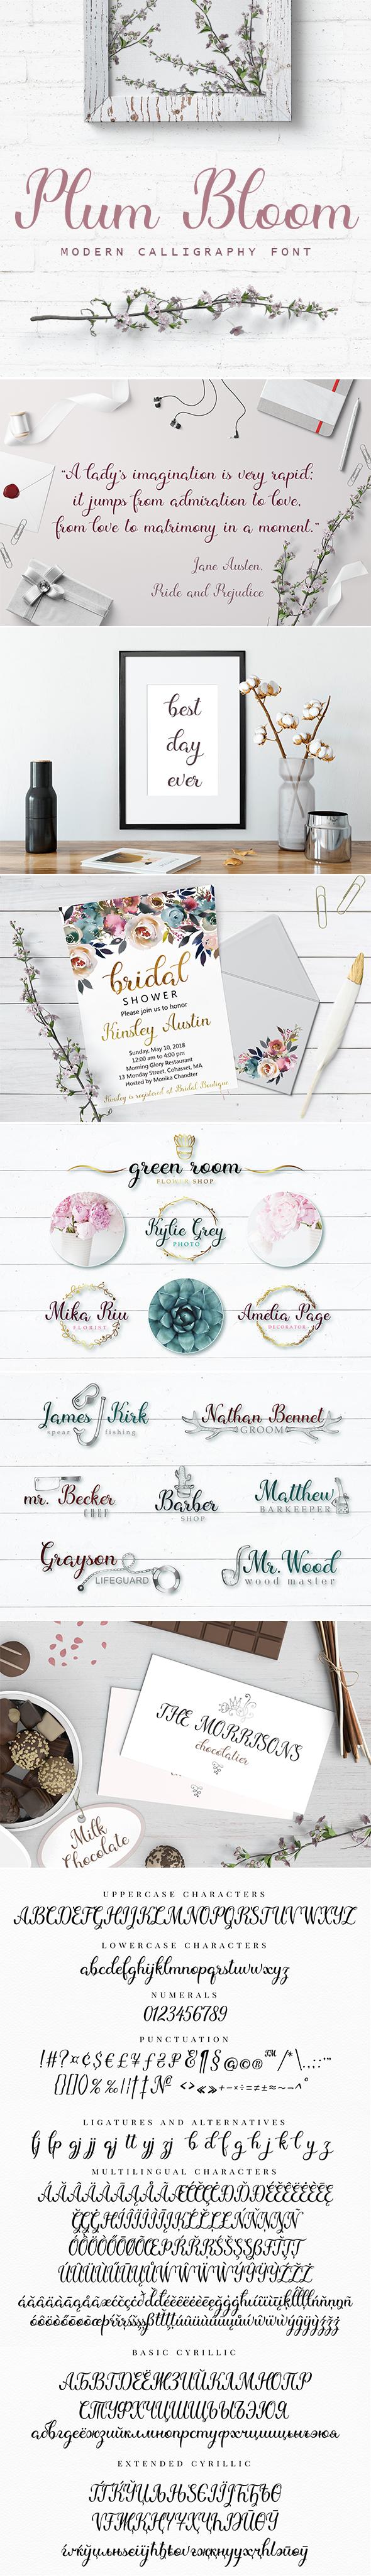 Plum Bloom - Font - Calligraphy Script